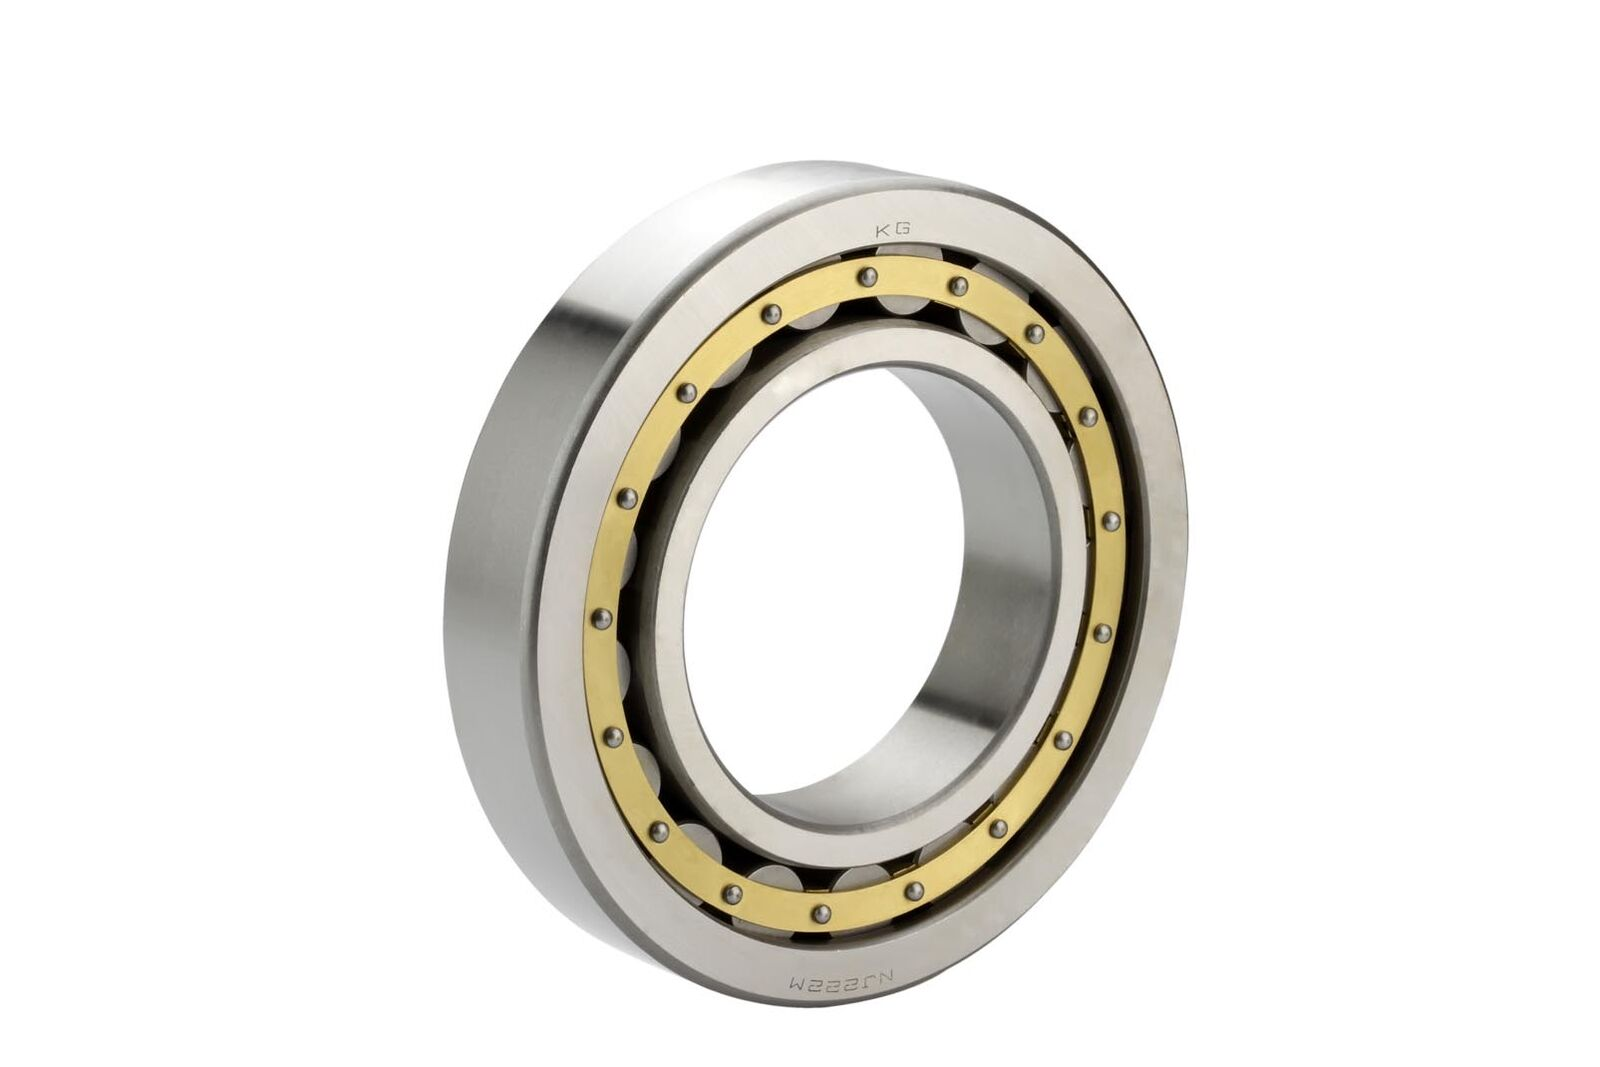 NUP219 Bearing ET NSK Cylindrical Roller Bearing NUP219 699f31